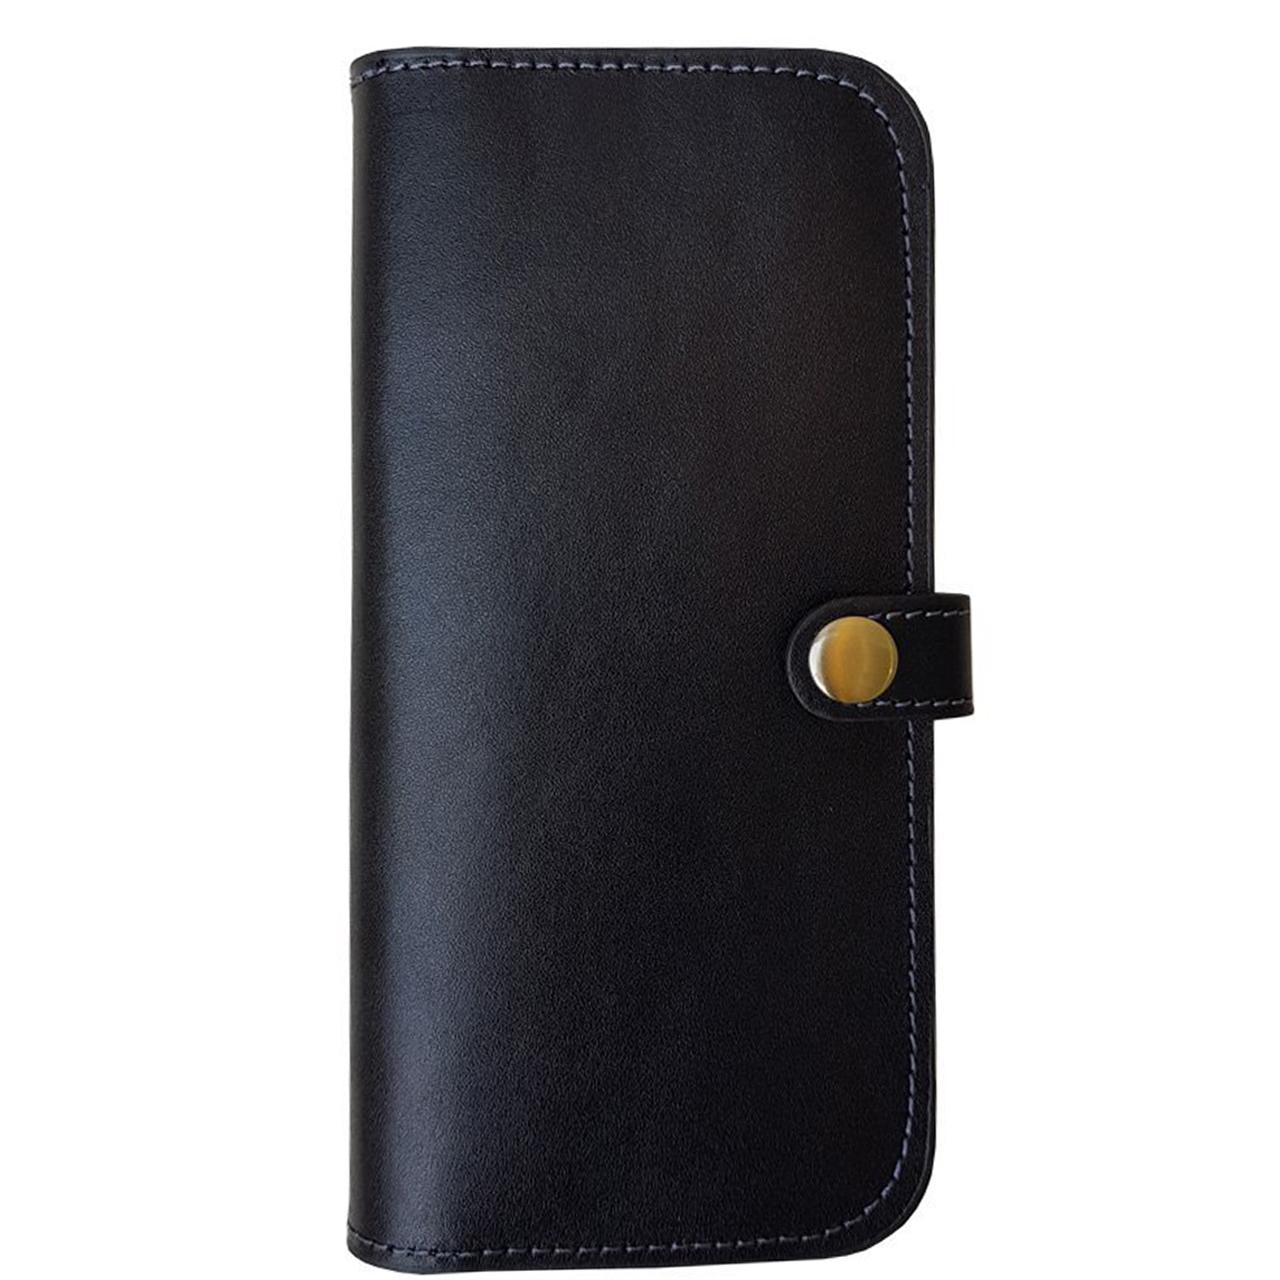 قیمت کیف پول و موبایل چرم زانکو مدل KM-220